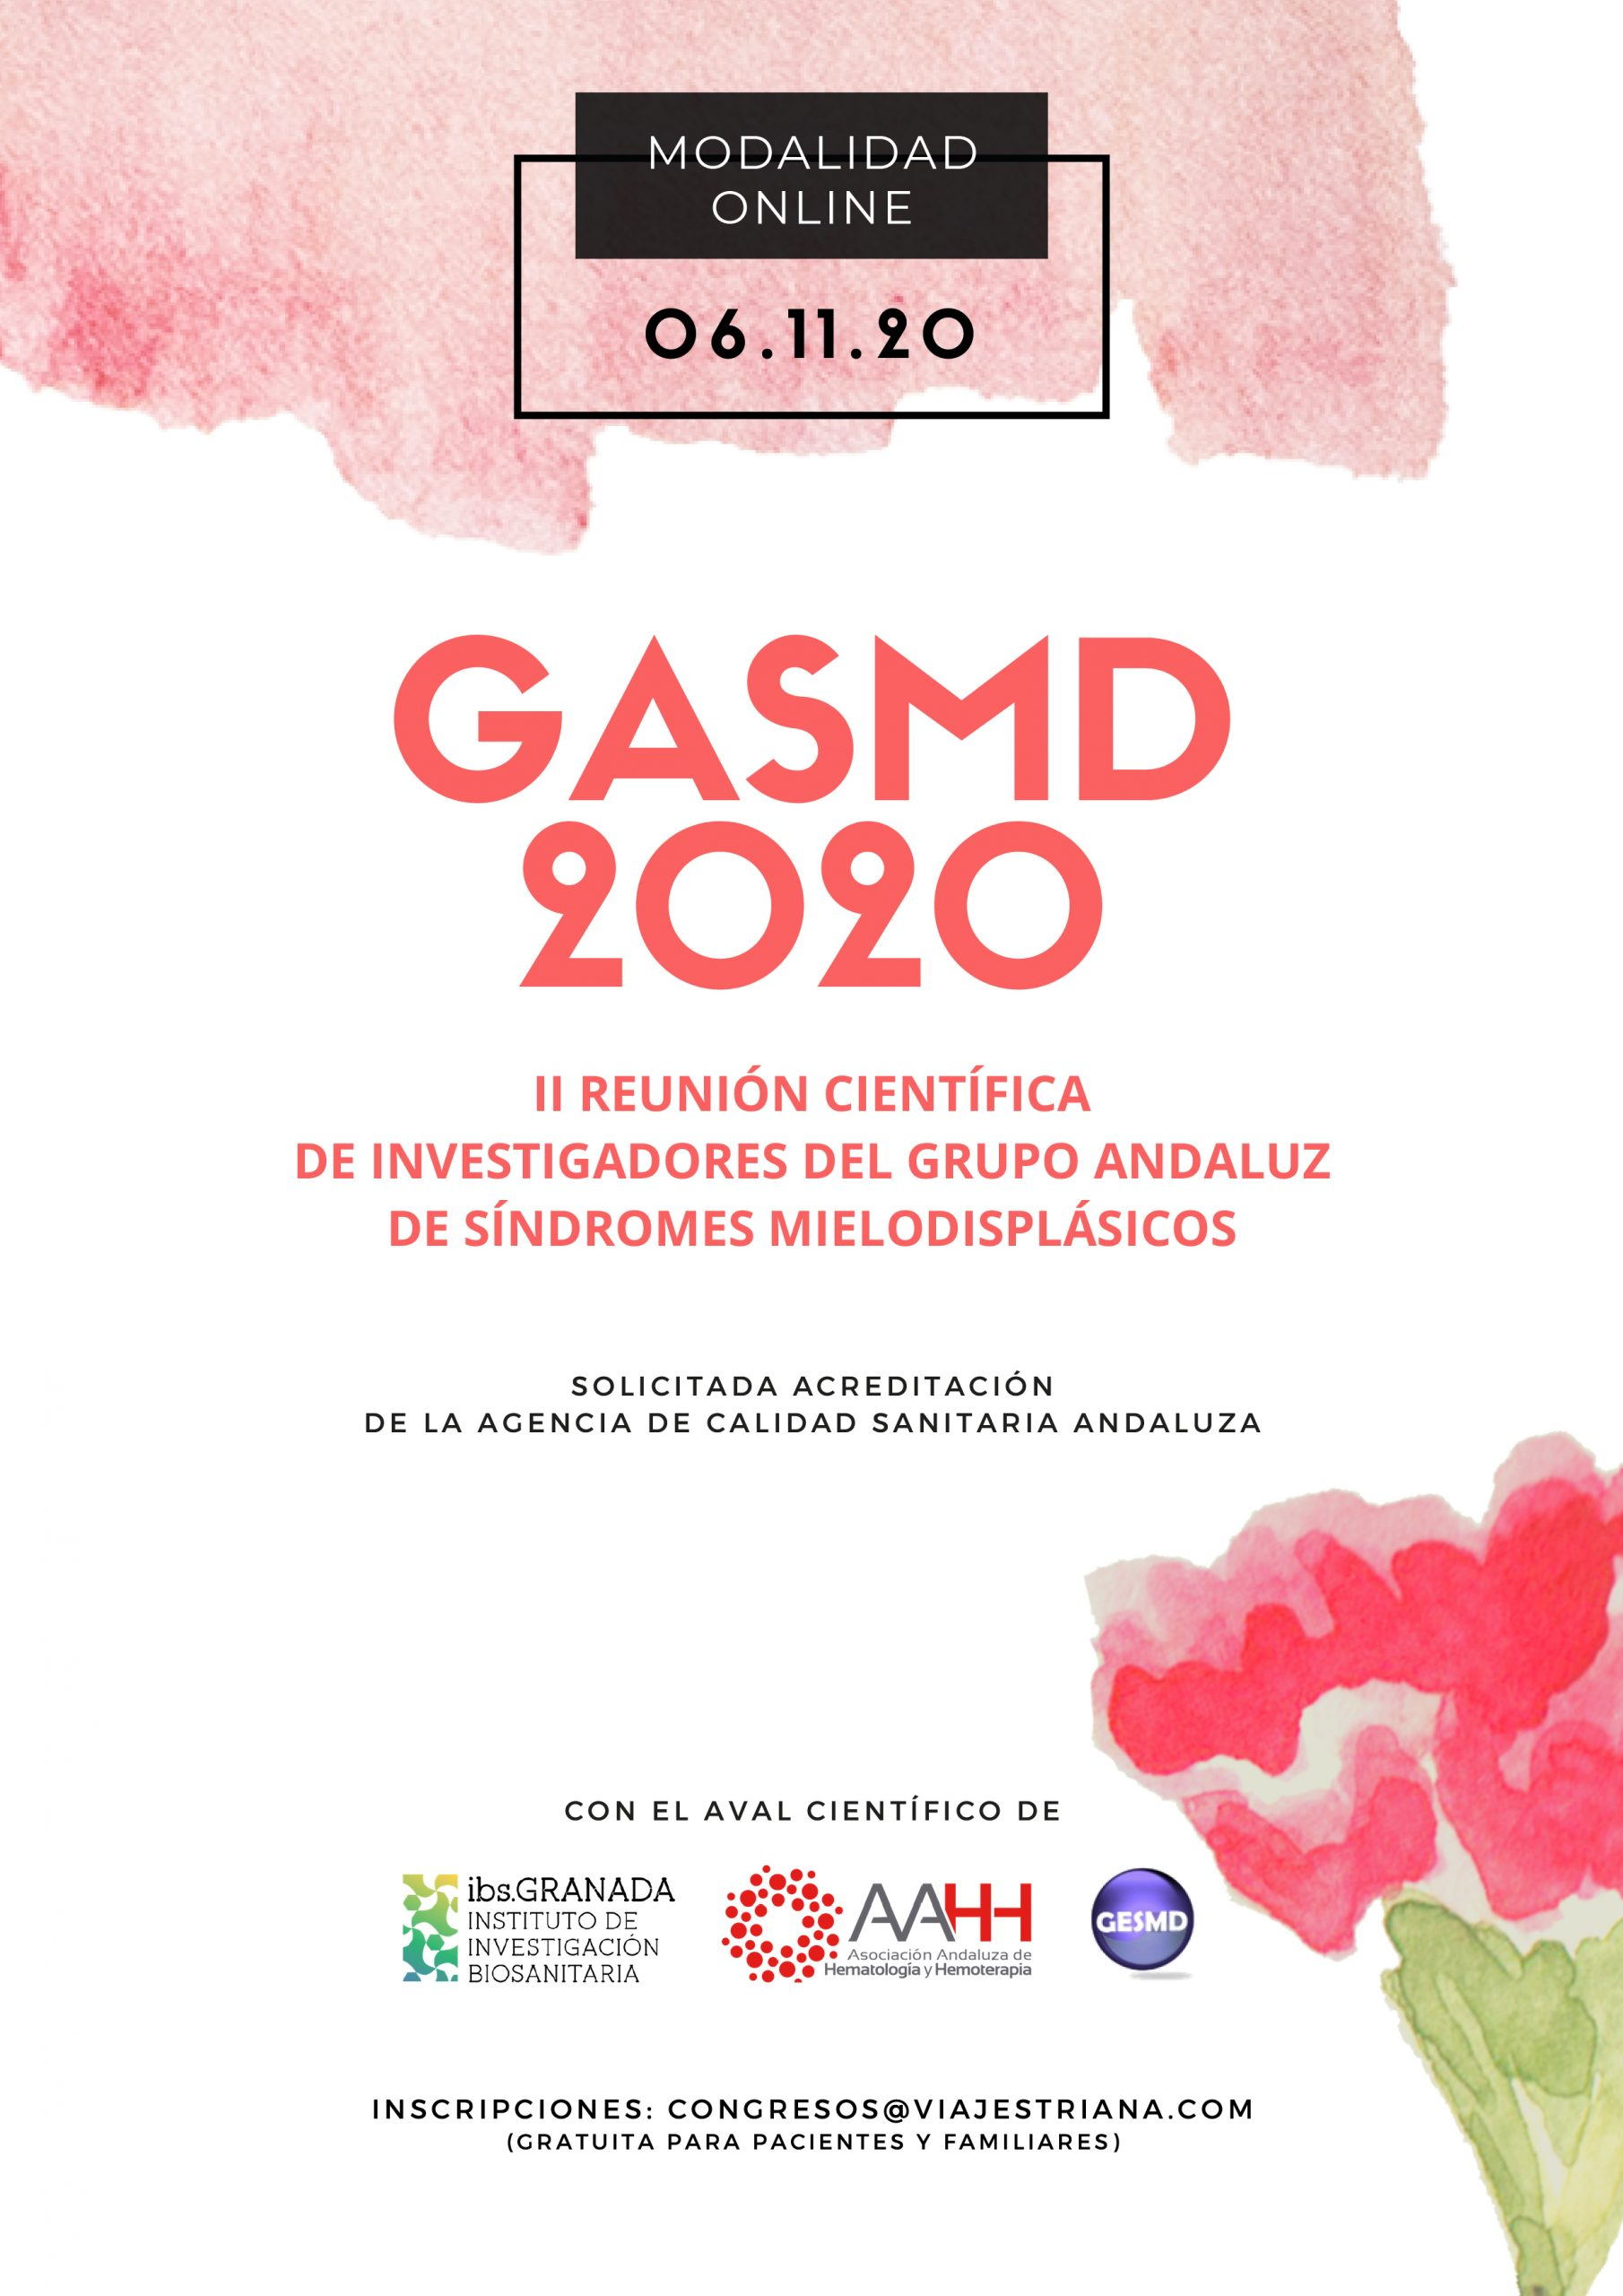 II Reunión Científica de Investigadores del Grupo Andaluz de Síndromes Mielodisplásicos 2020